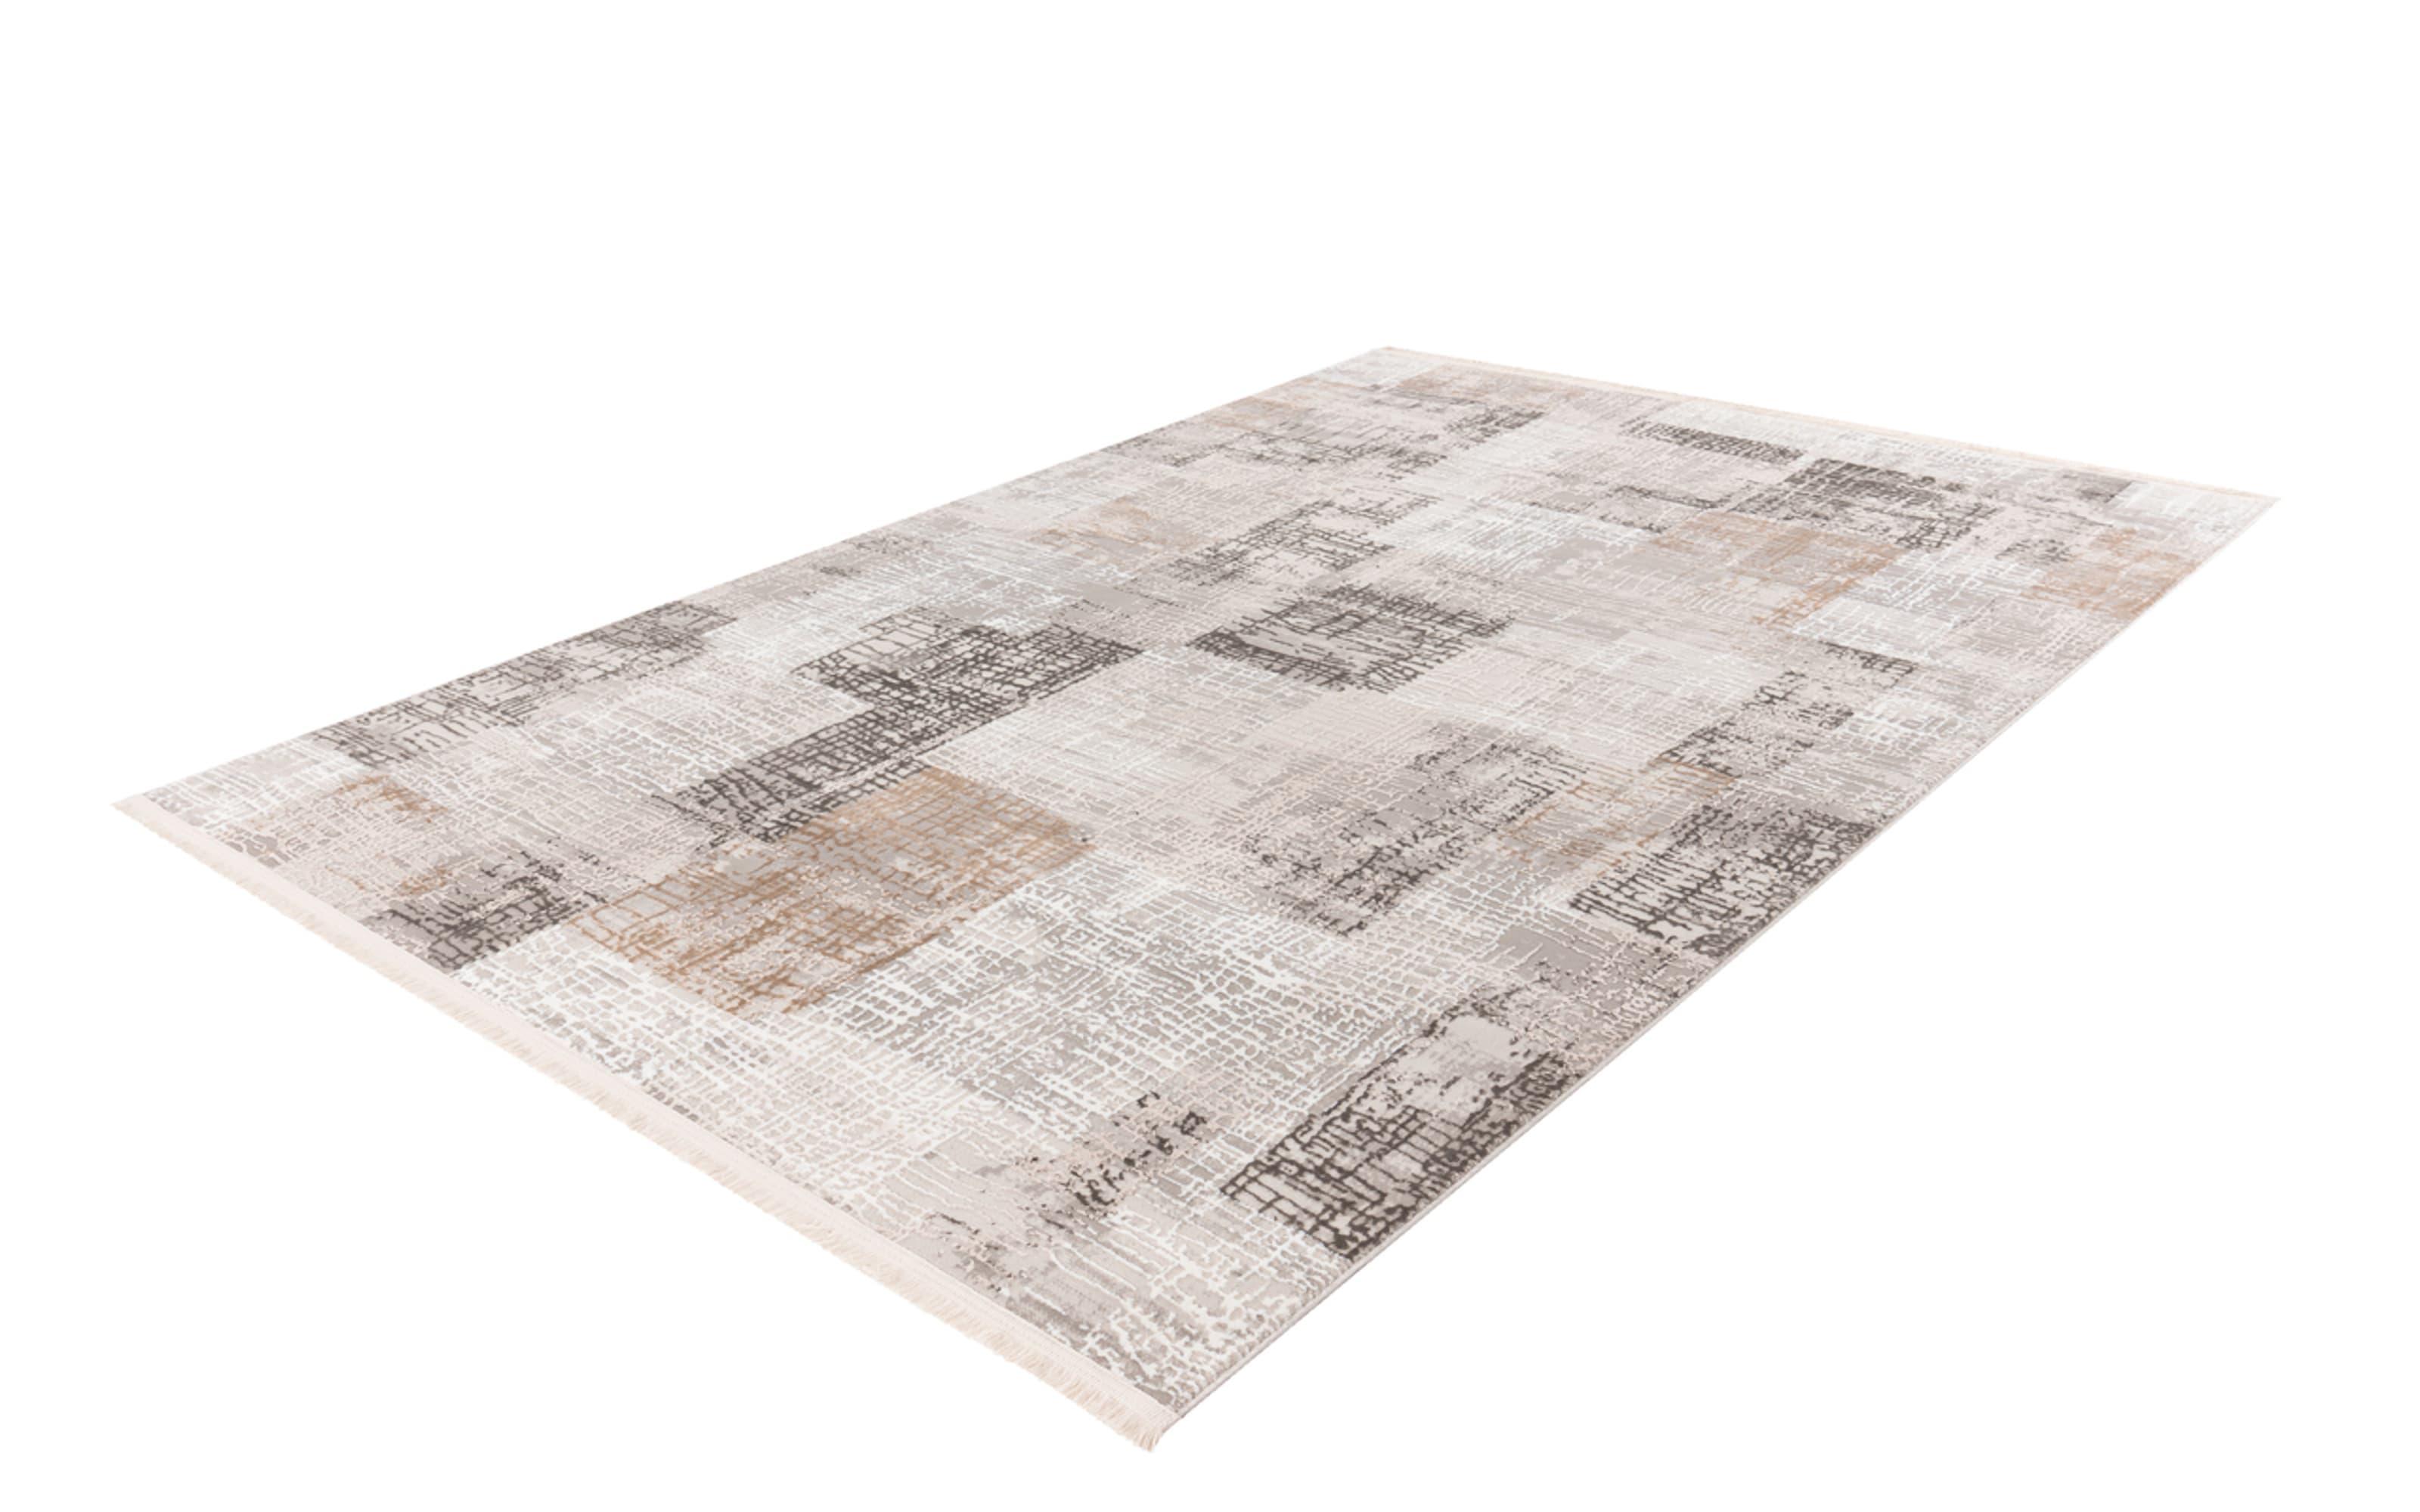 Teppich Akropolis 425 in grau-silber, ca. 80 x 150 cm